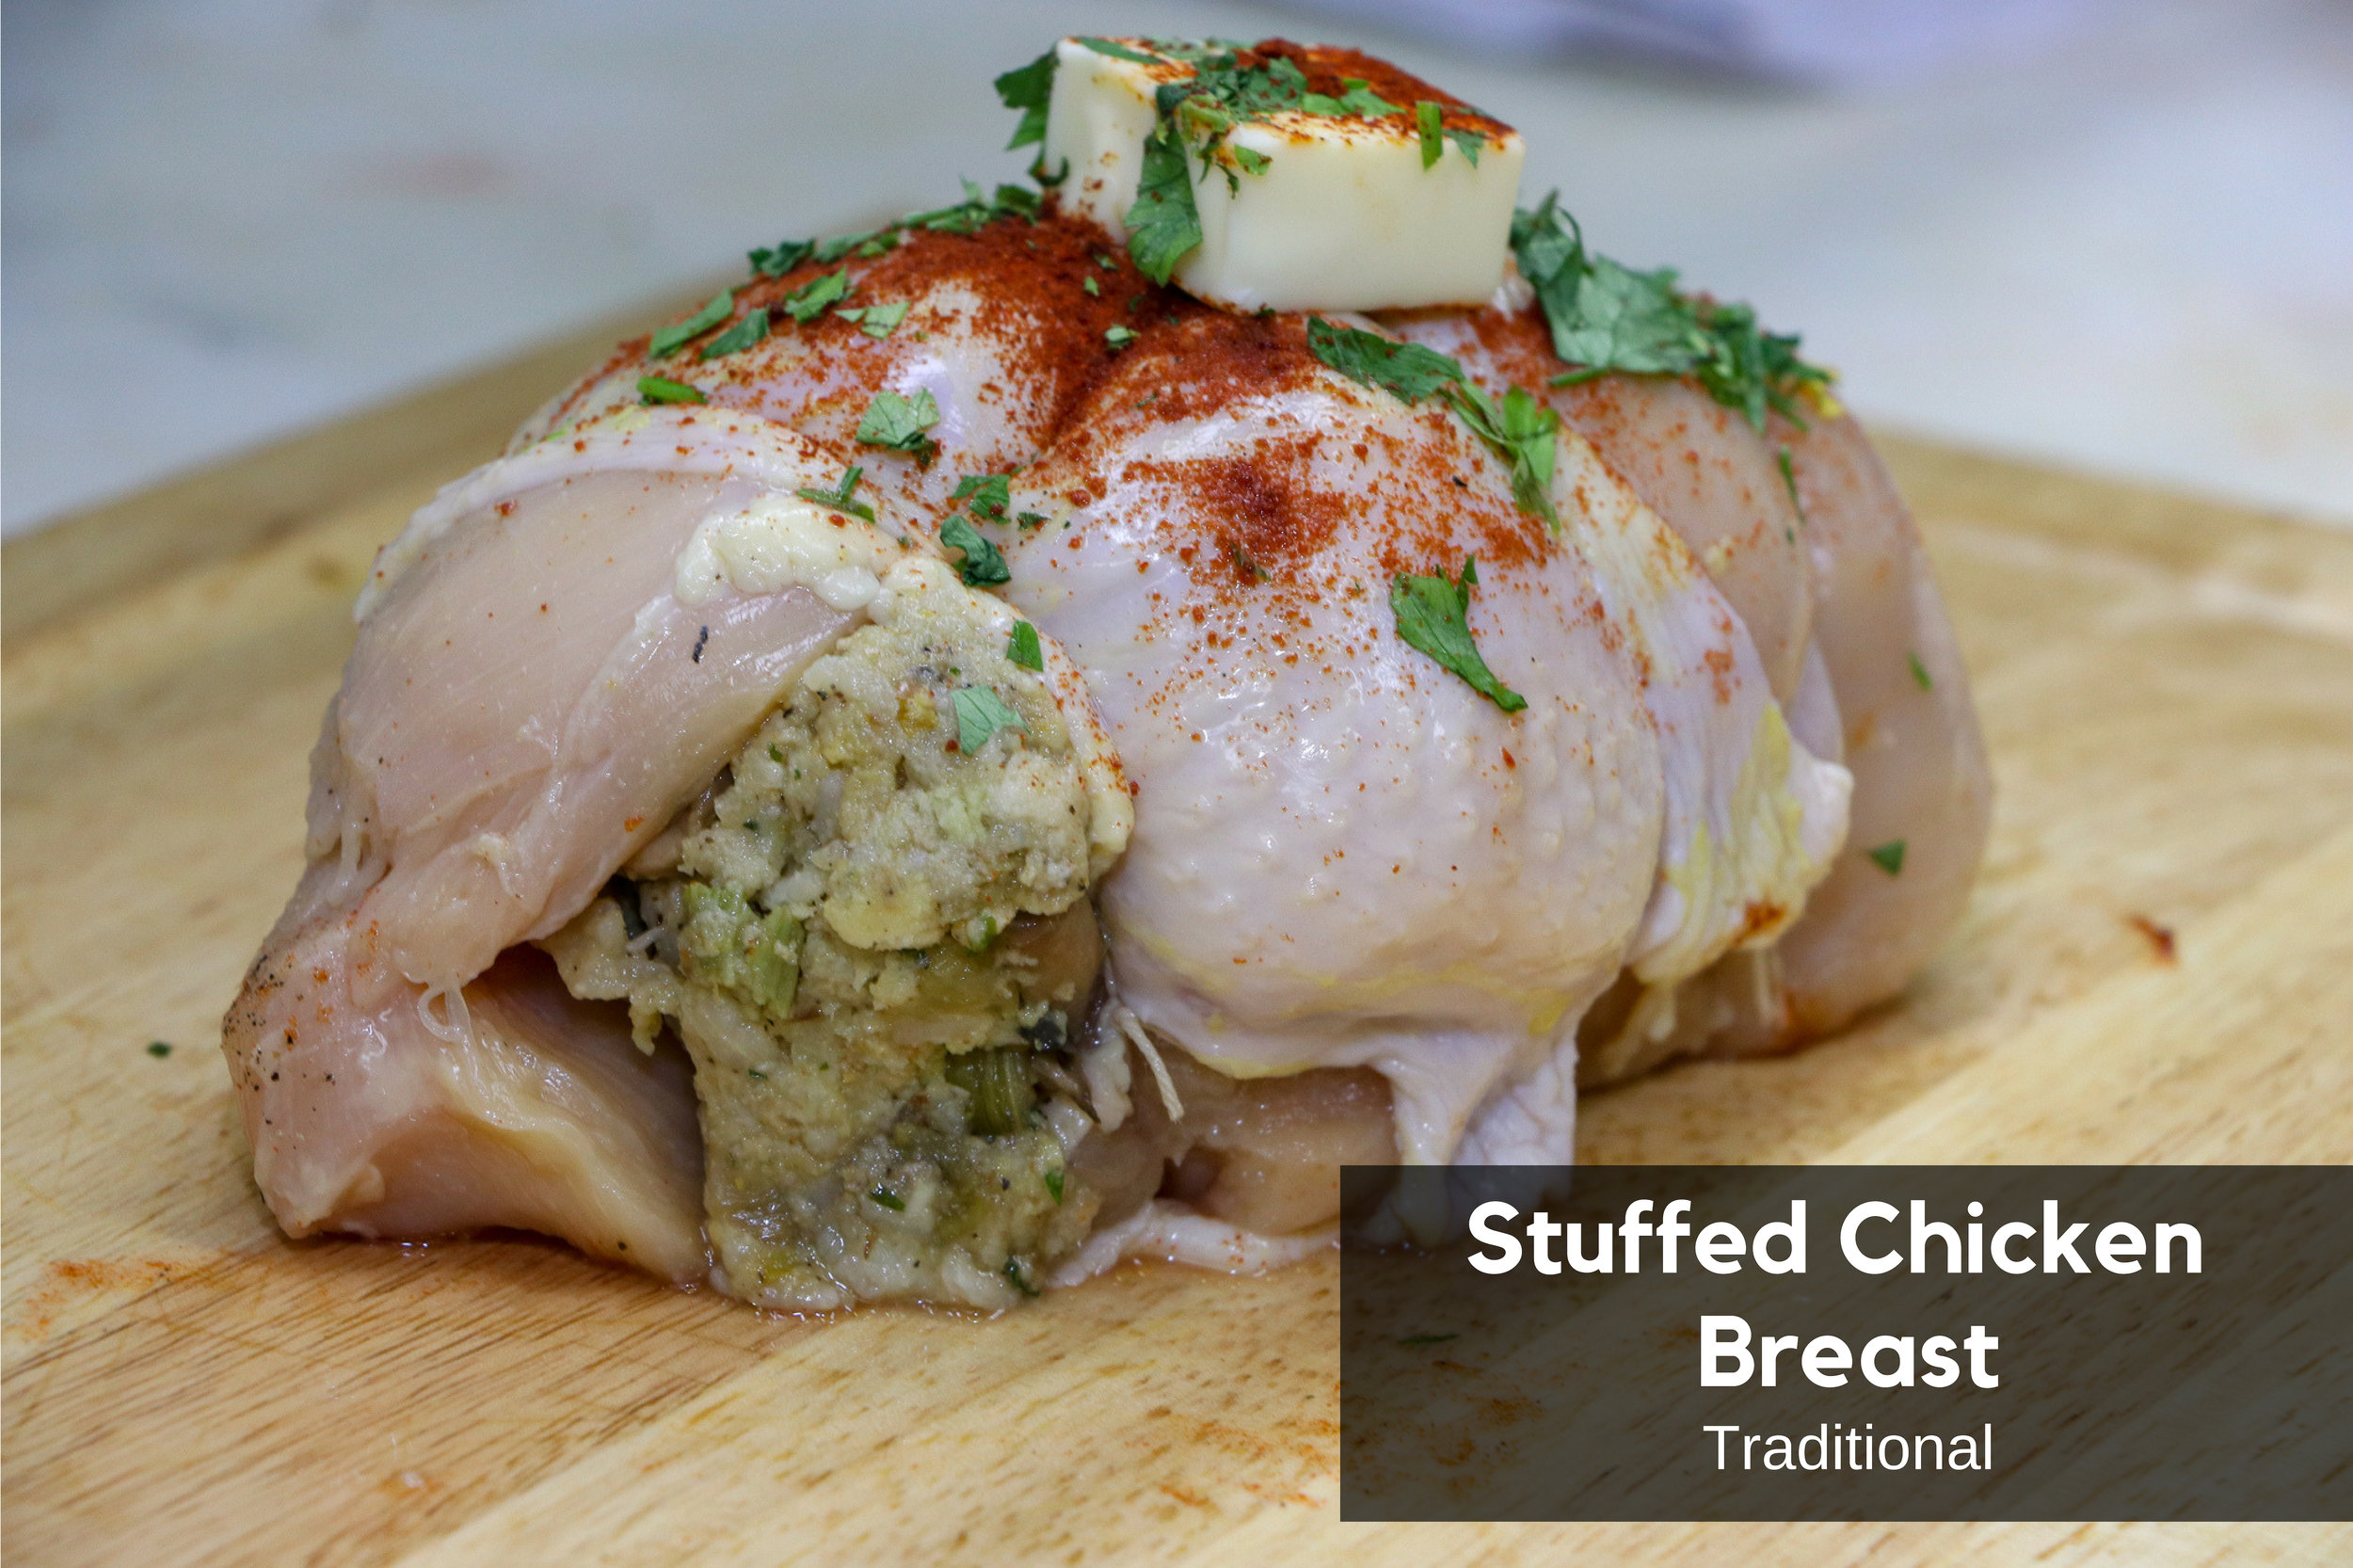 traditional+stuffed+chicken+breast.jpg